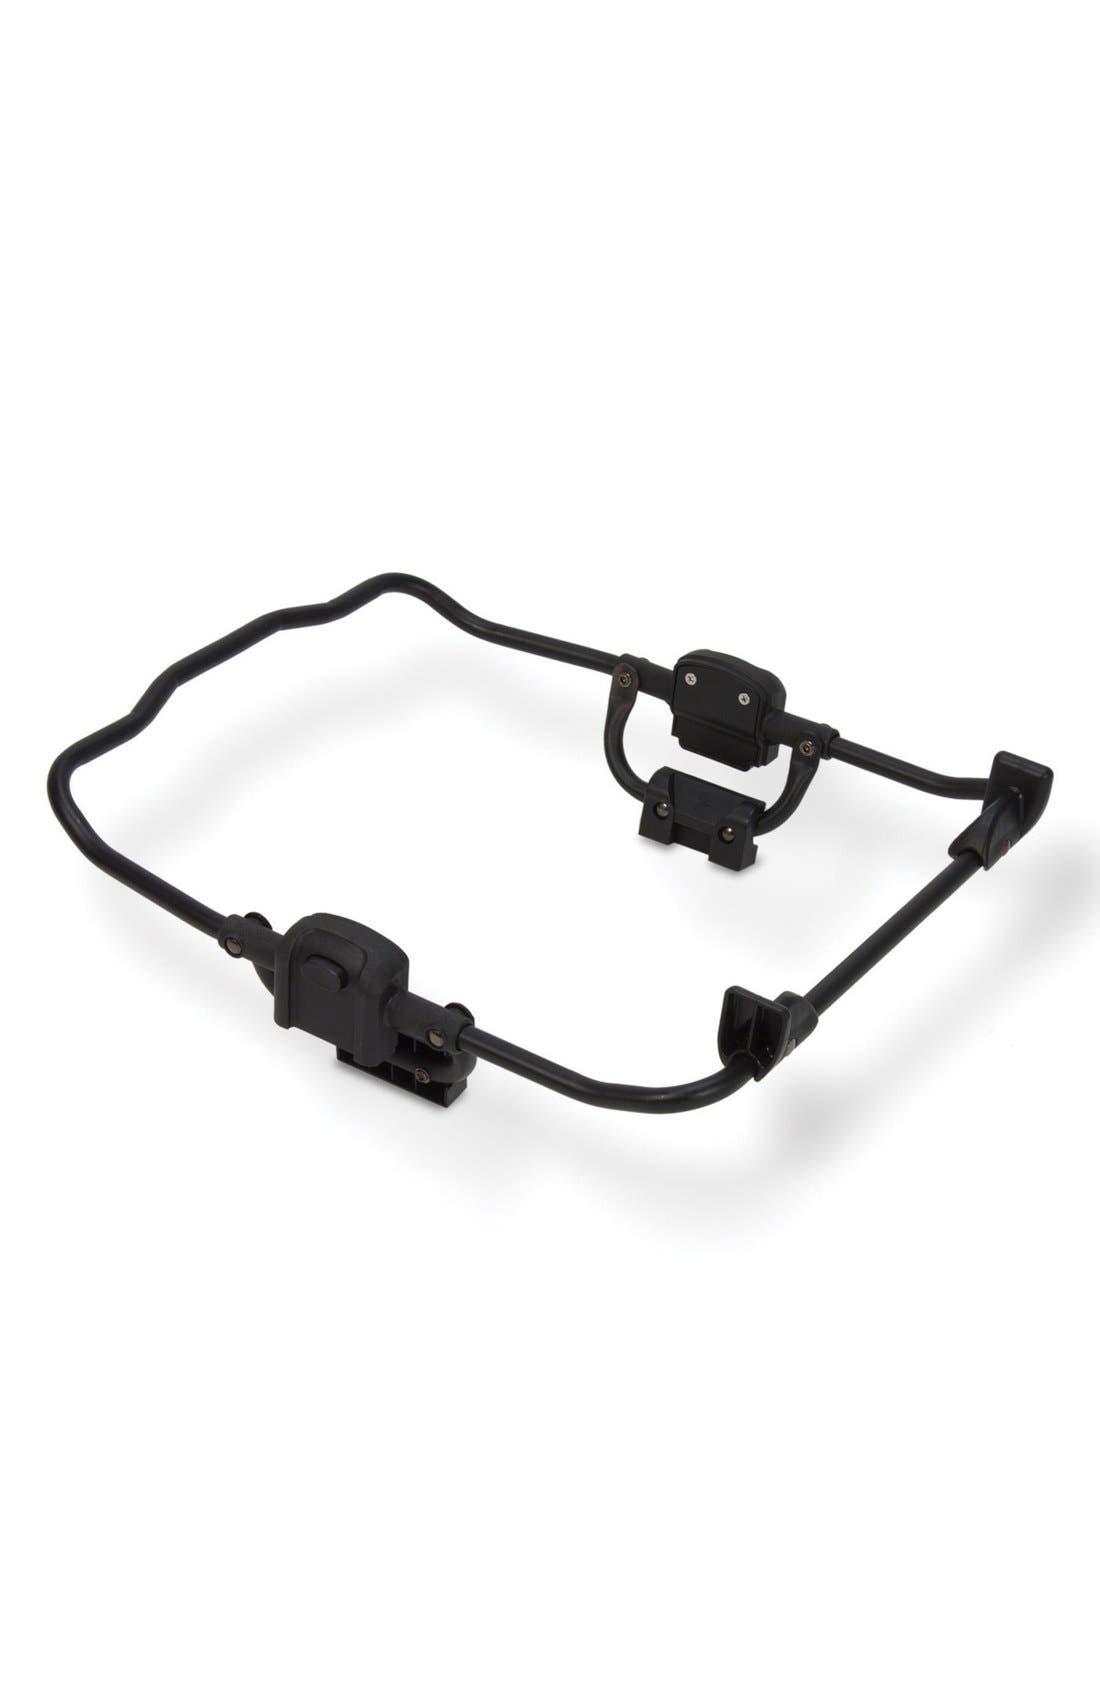 UPPAbaby VISTA & CRUZ Stroller to Chicco® Car Seat Adapter